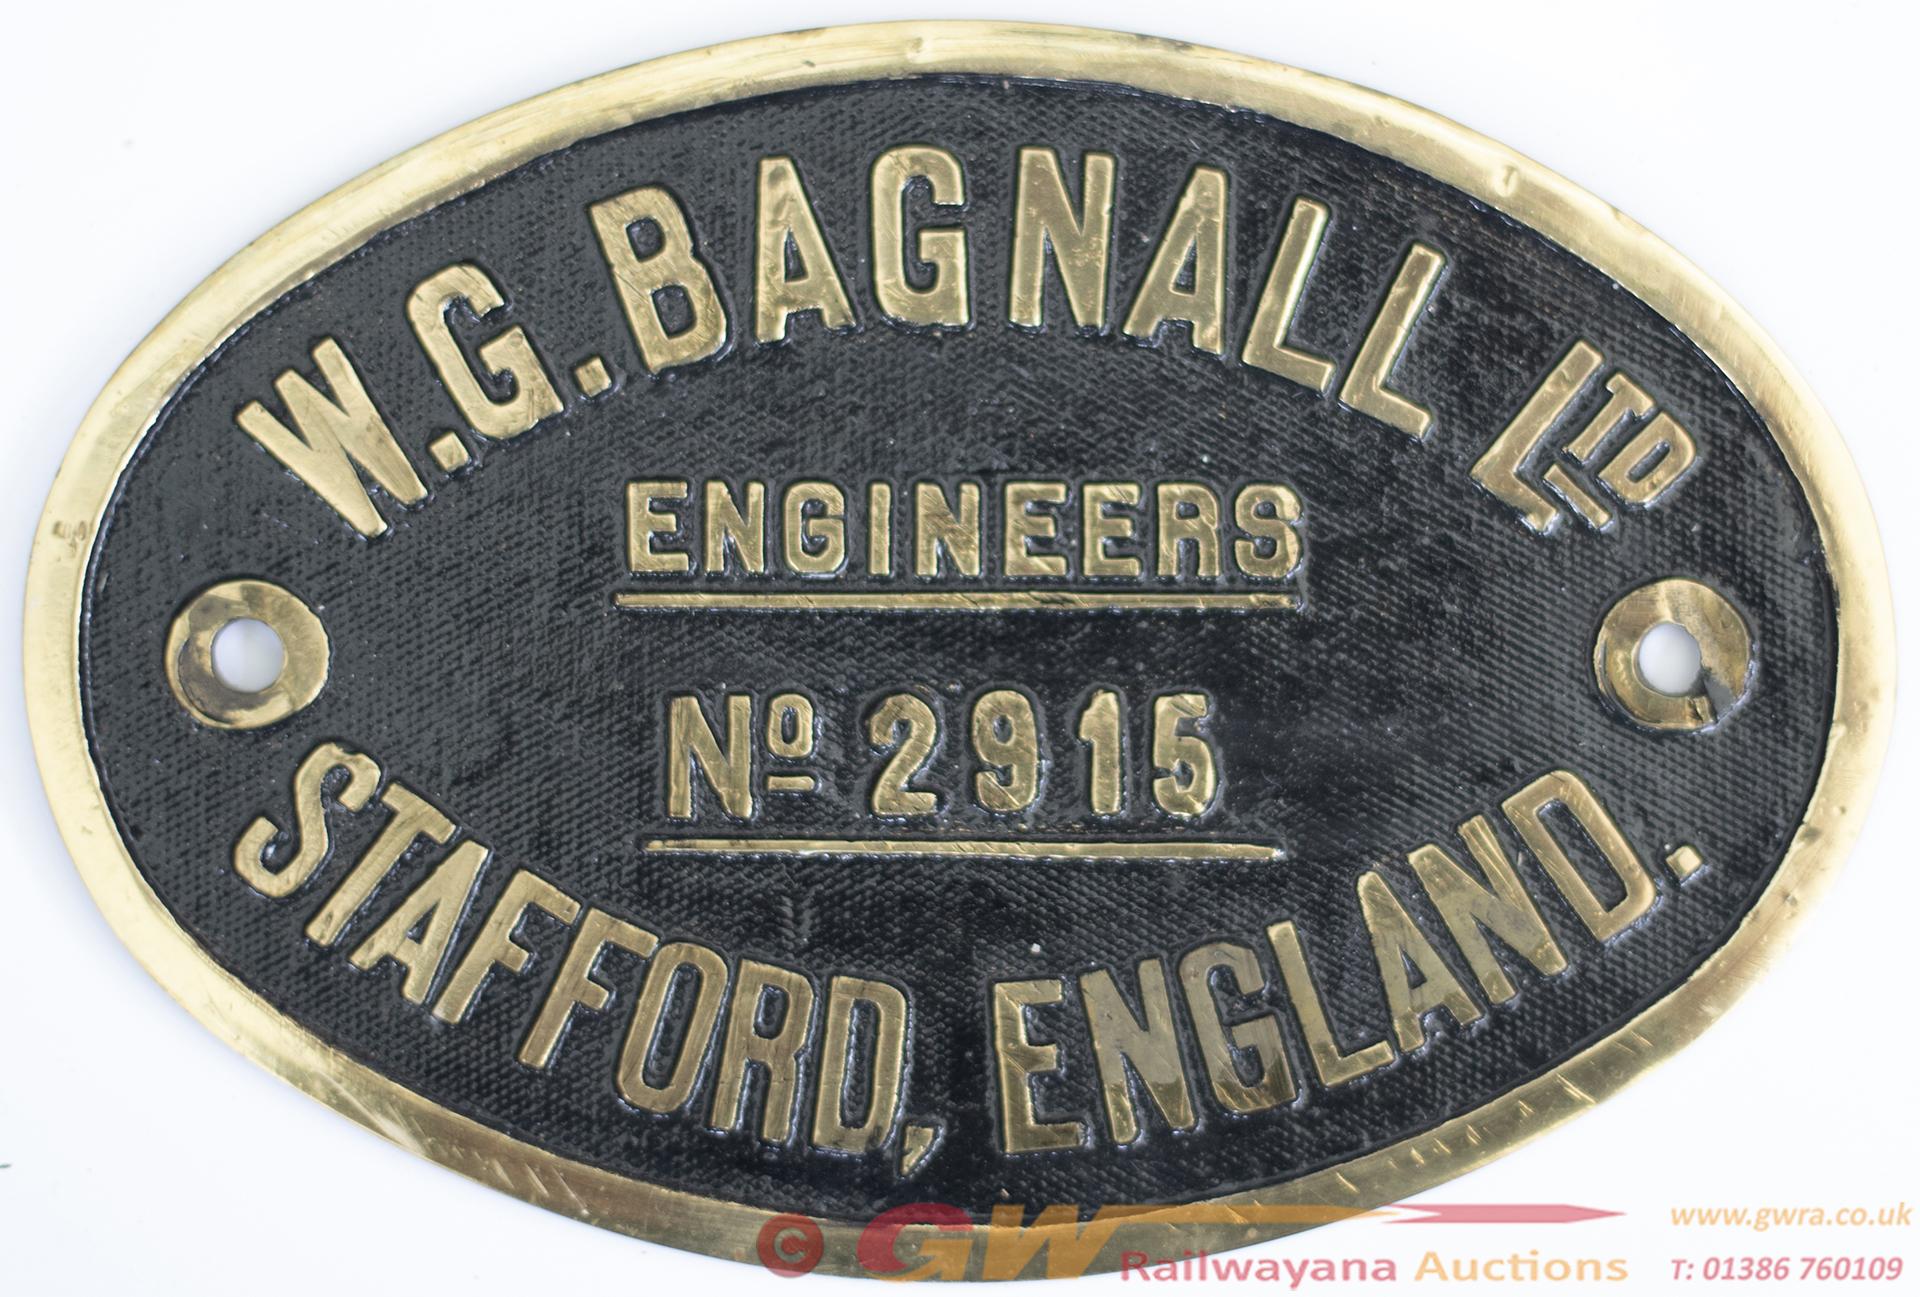 Worksplate W.G.BAGNALL LTD ENGINEERS STAFFORD